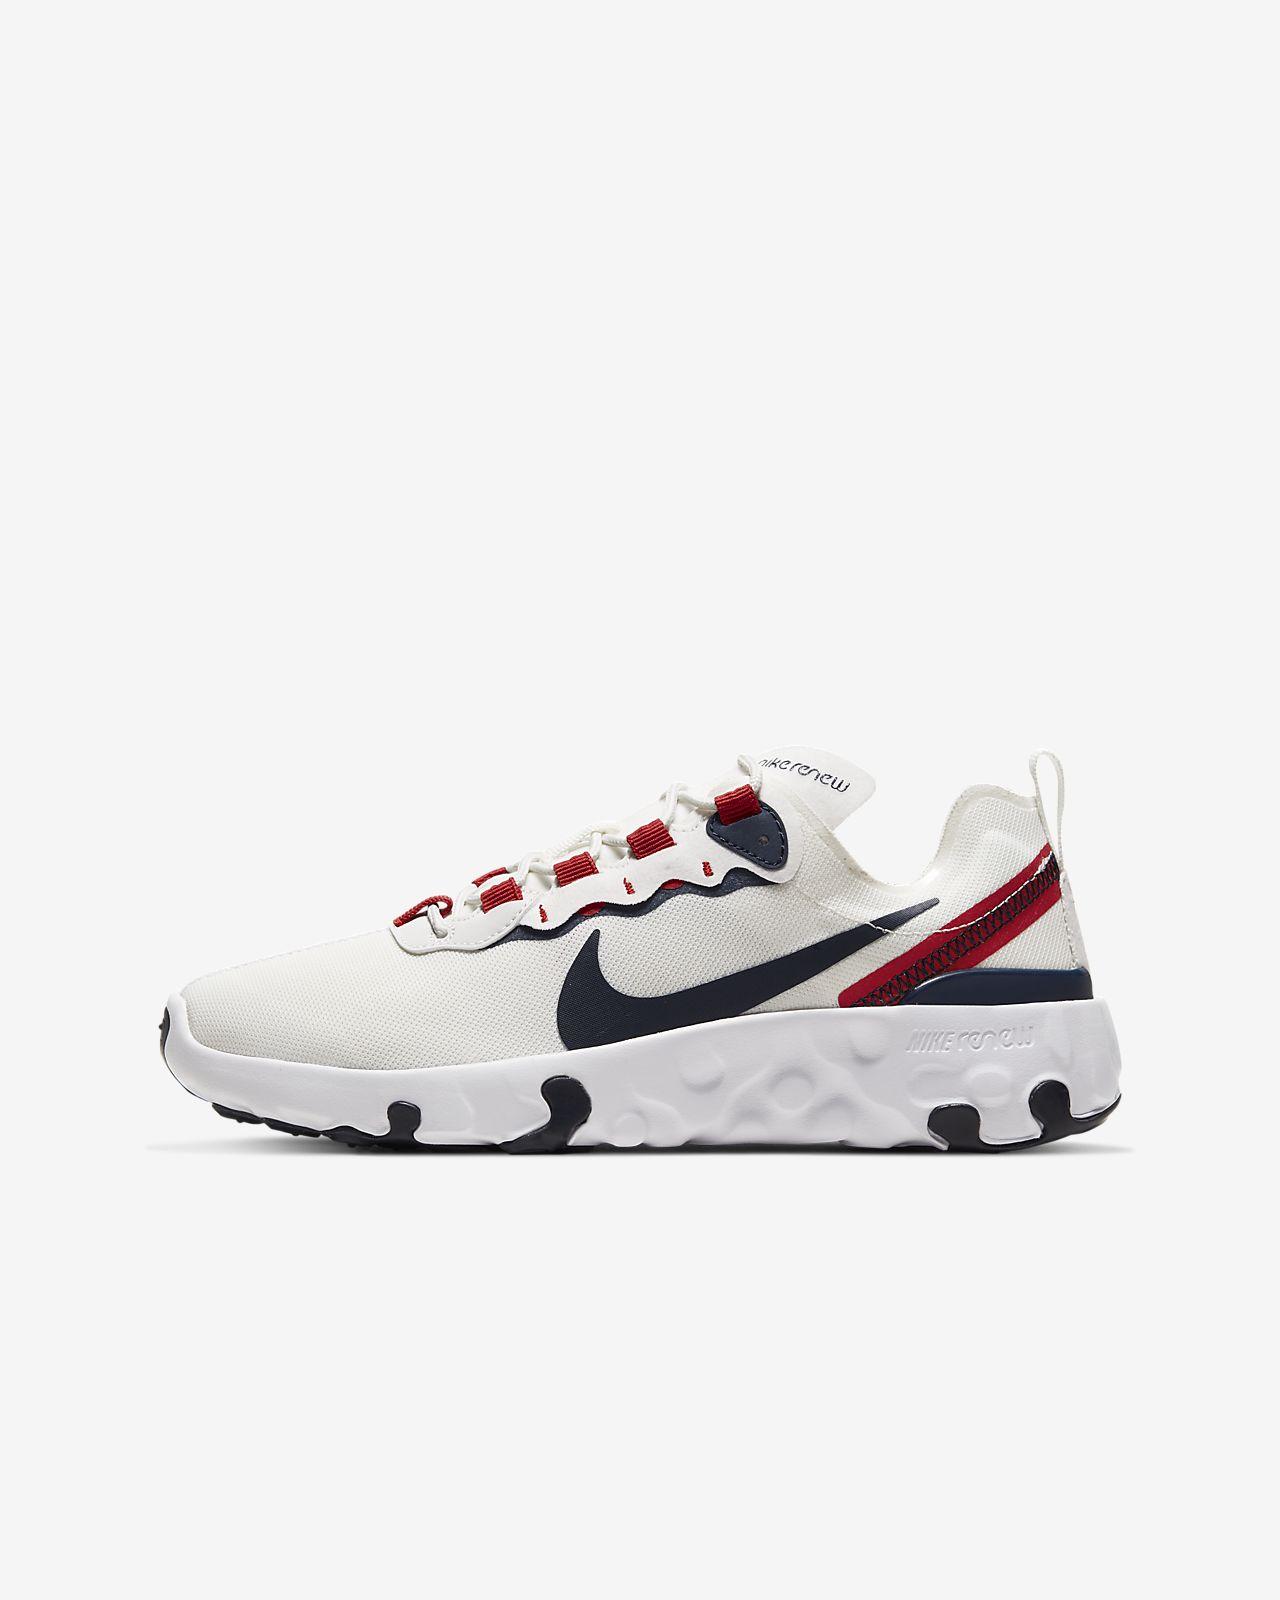 Nike Shoe Size Chart: Conversion for Men's, Women's & Kids